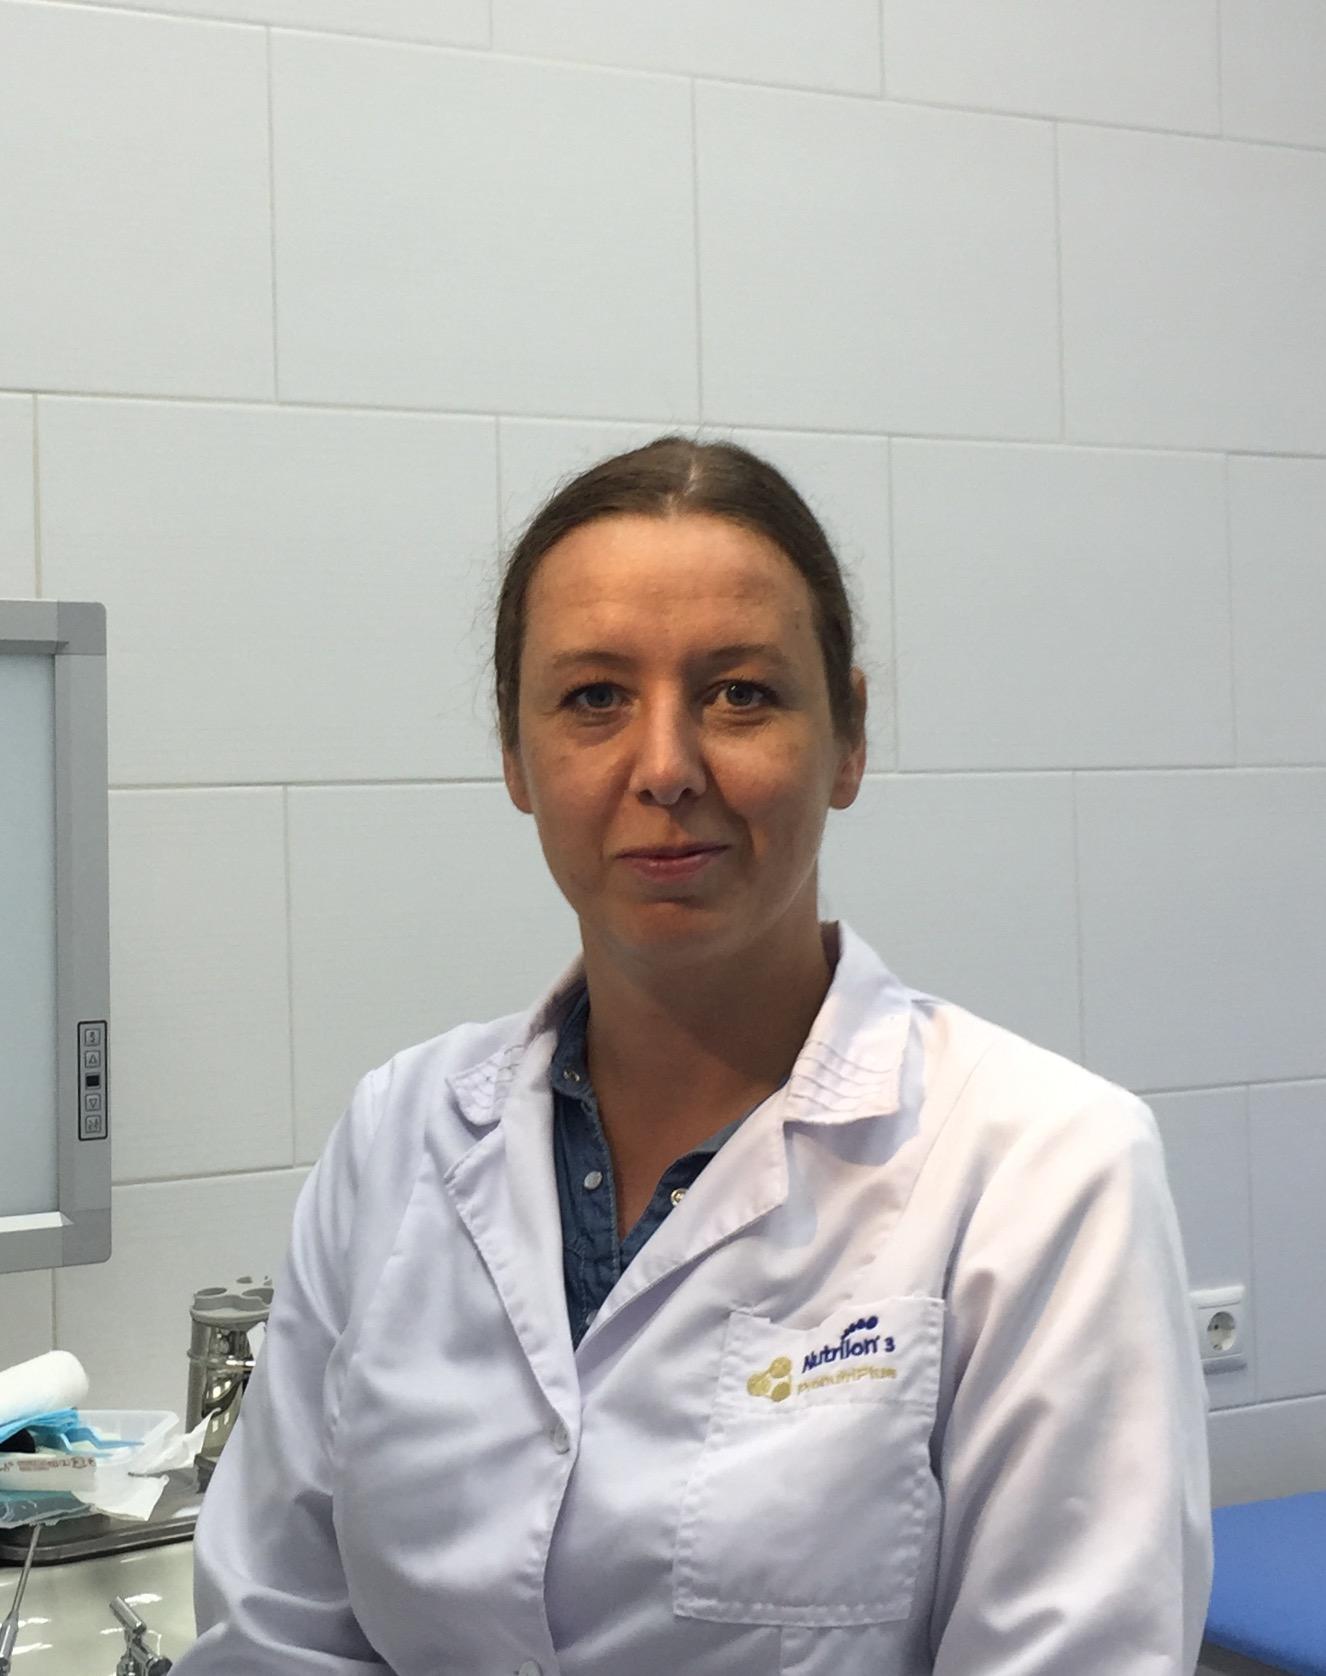 Нейман-Заде Сабина Валерьевна – врач-оториноларинголог